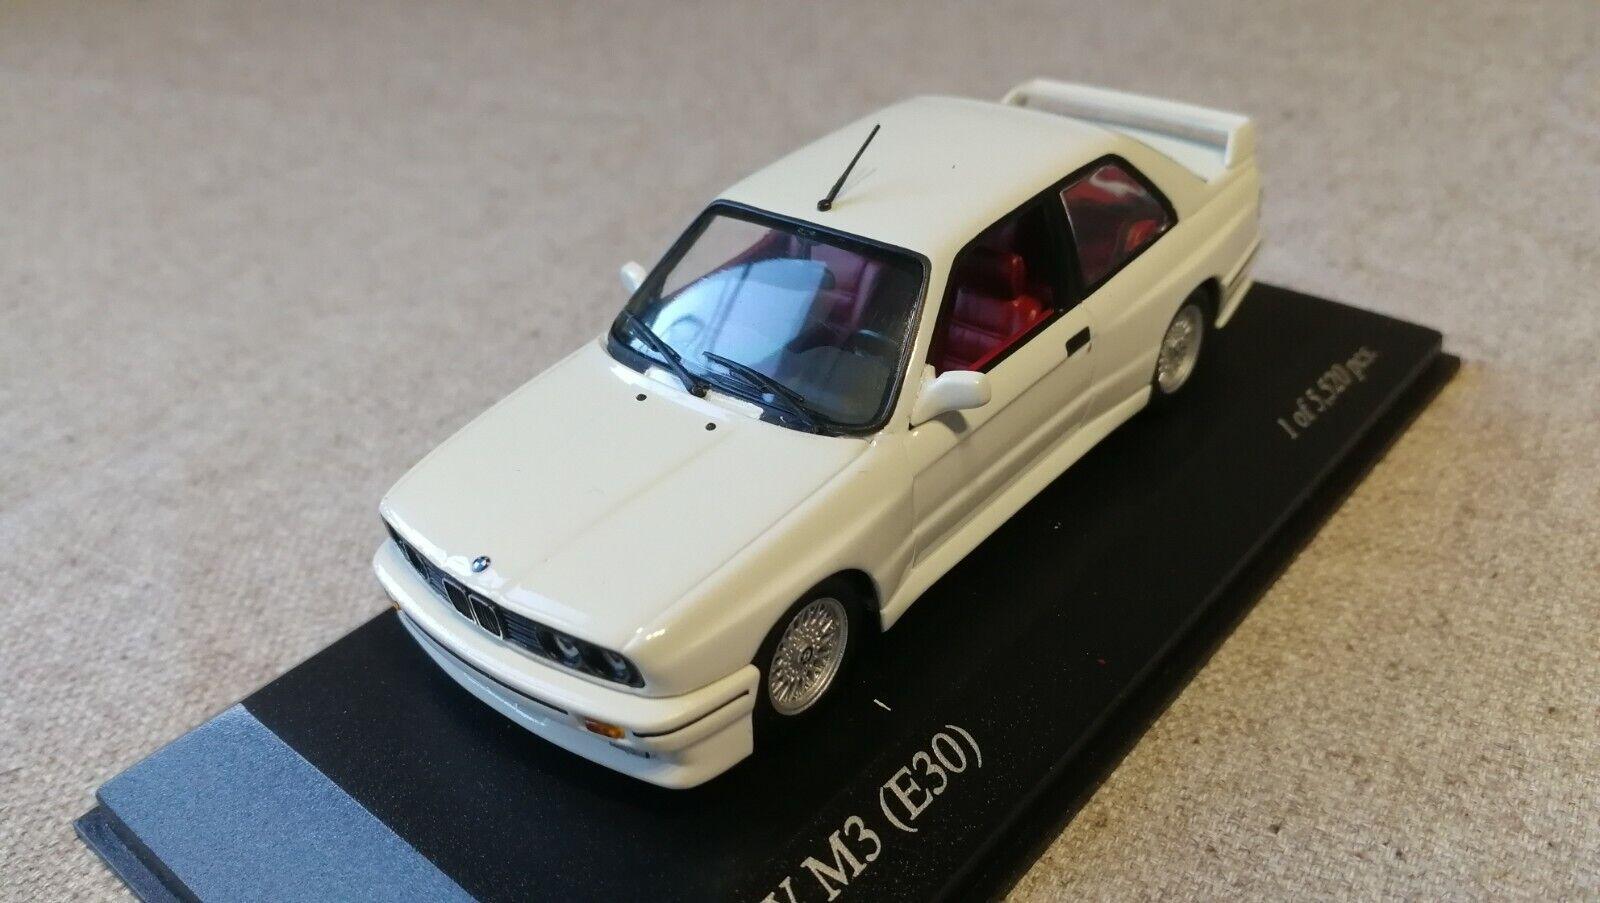 1:43 maxichamps bmw m3 e30 by Raceface-modelcars